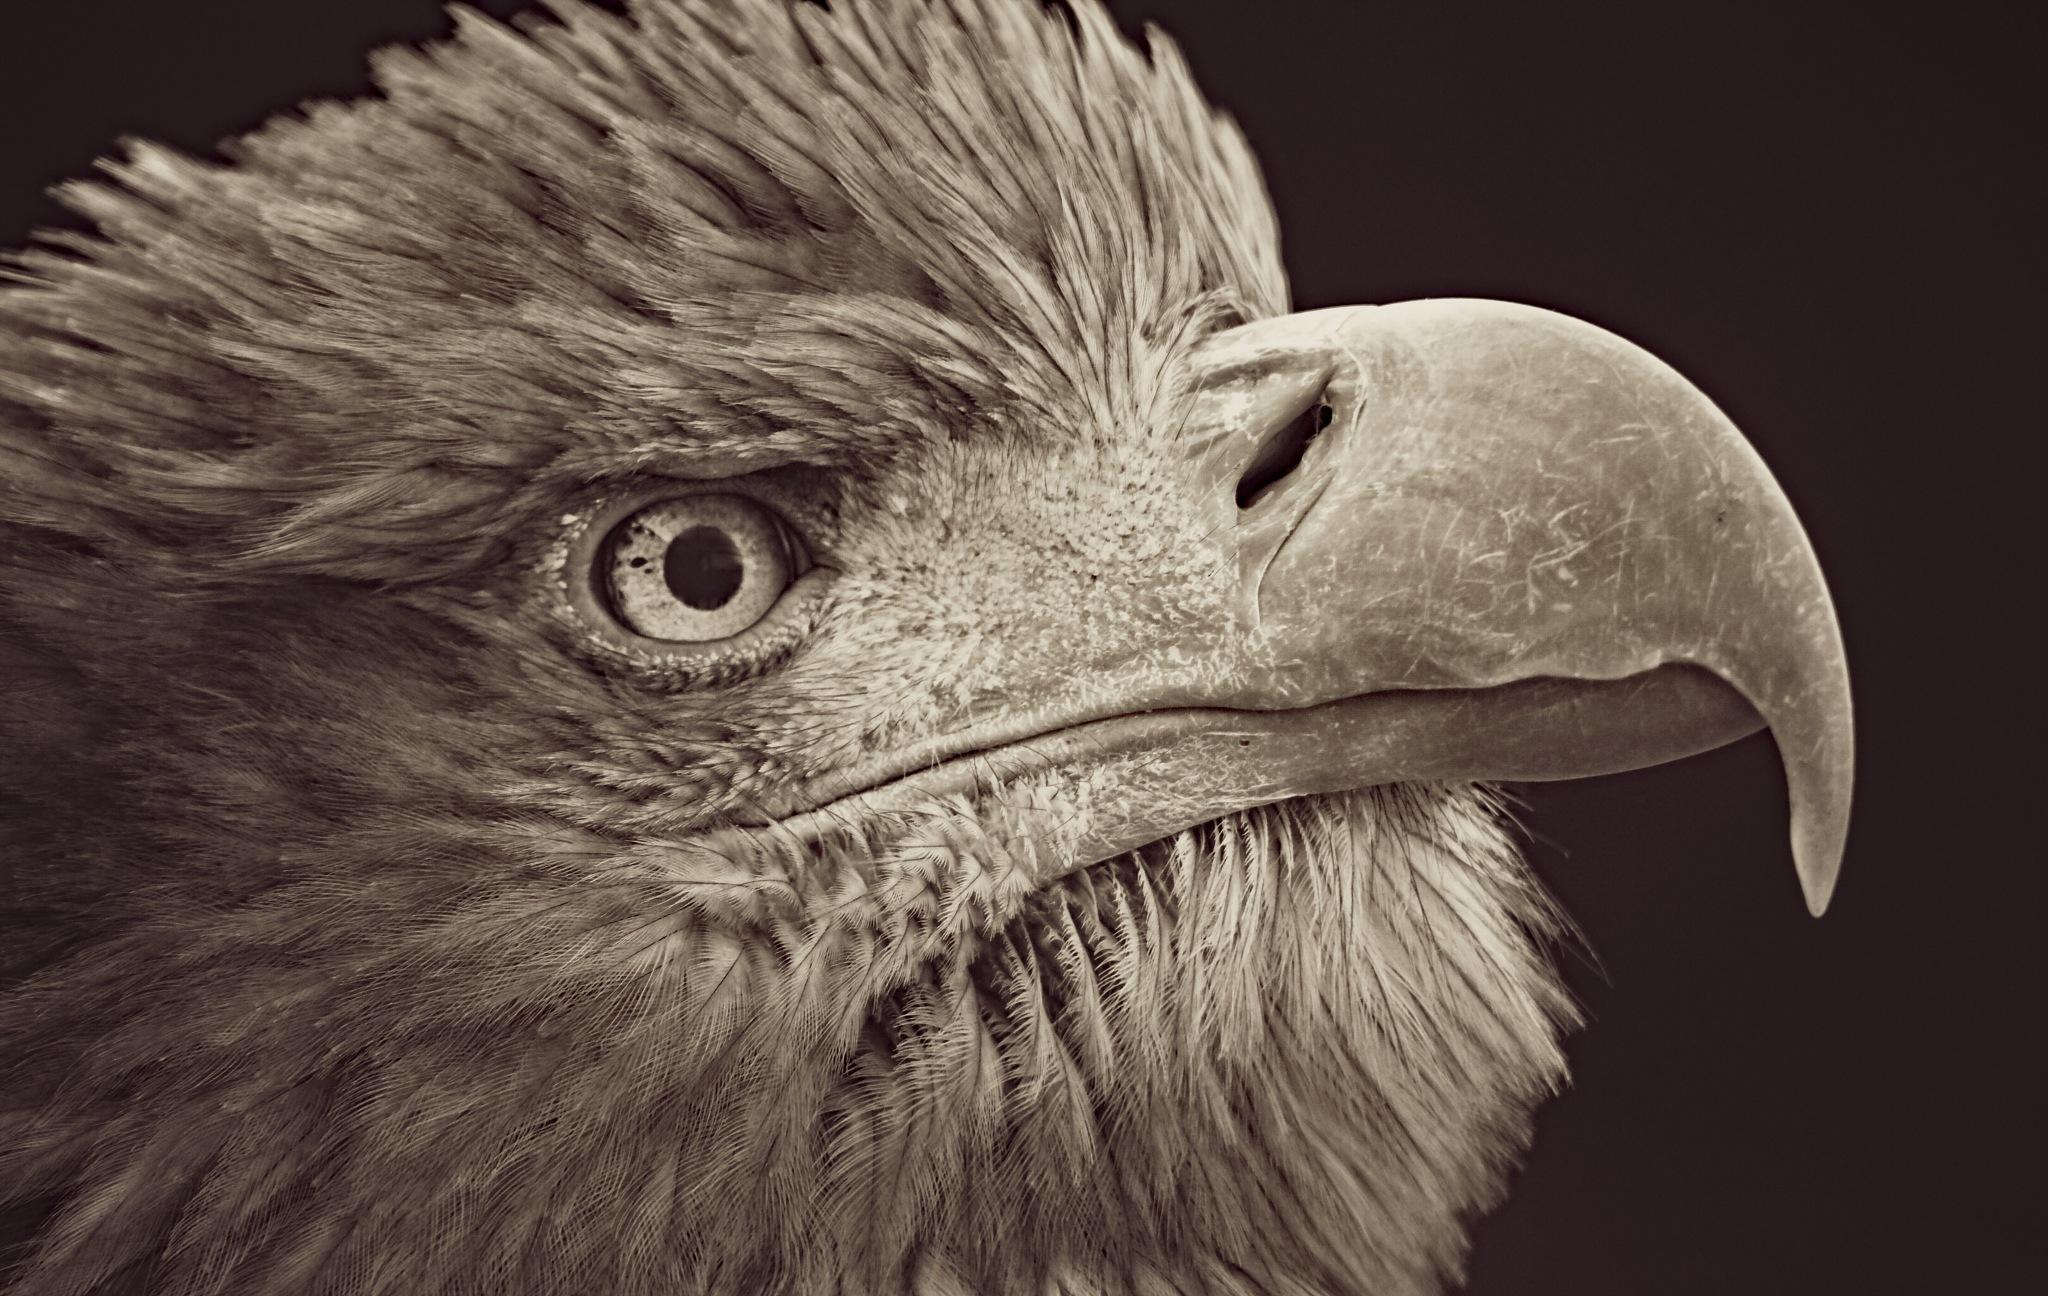 Eagle eye by Mio Romanic